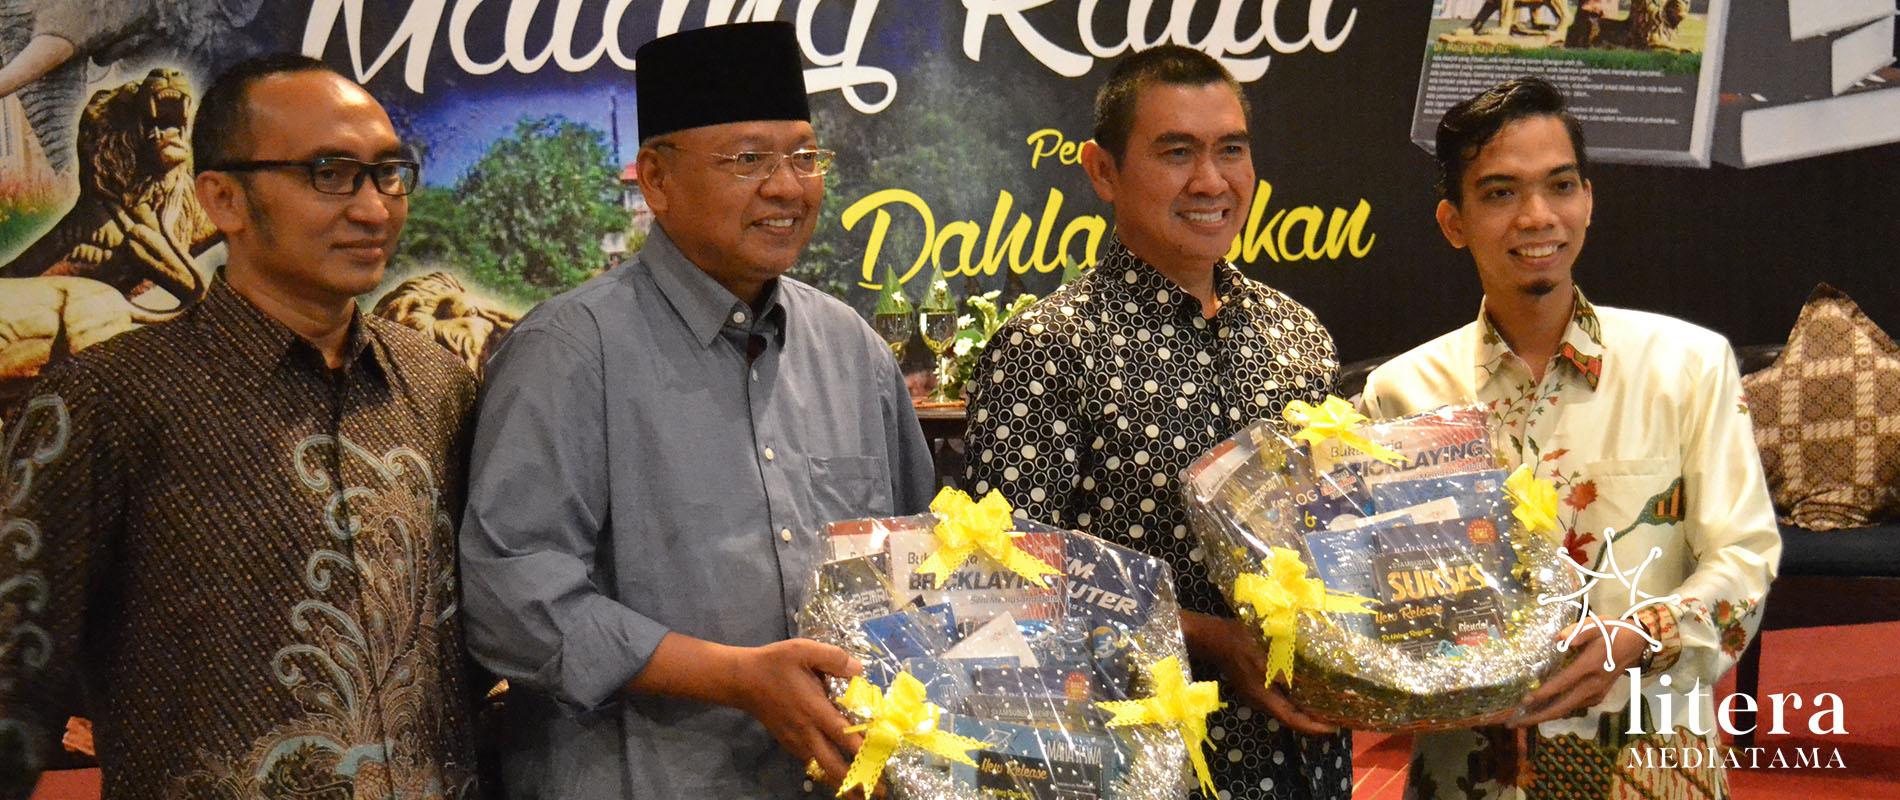 David Ming bersama Kurniawan Muhammad (direktur Radar Malang), rendra Kresna Bupati kab Malang, Abah Anton (walikota Malang)